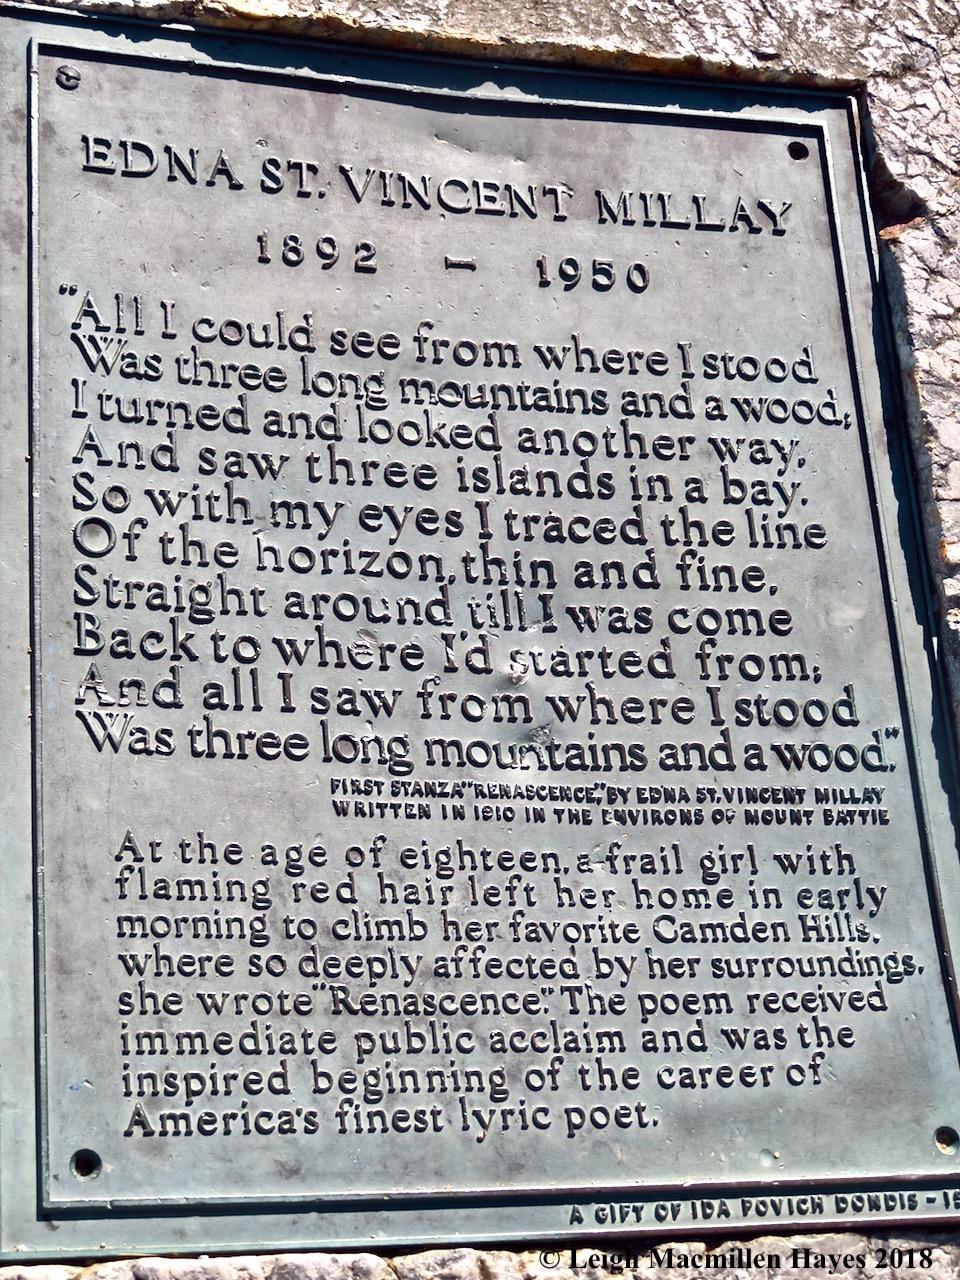 32-Edna St. Vincent Millay